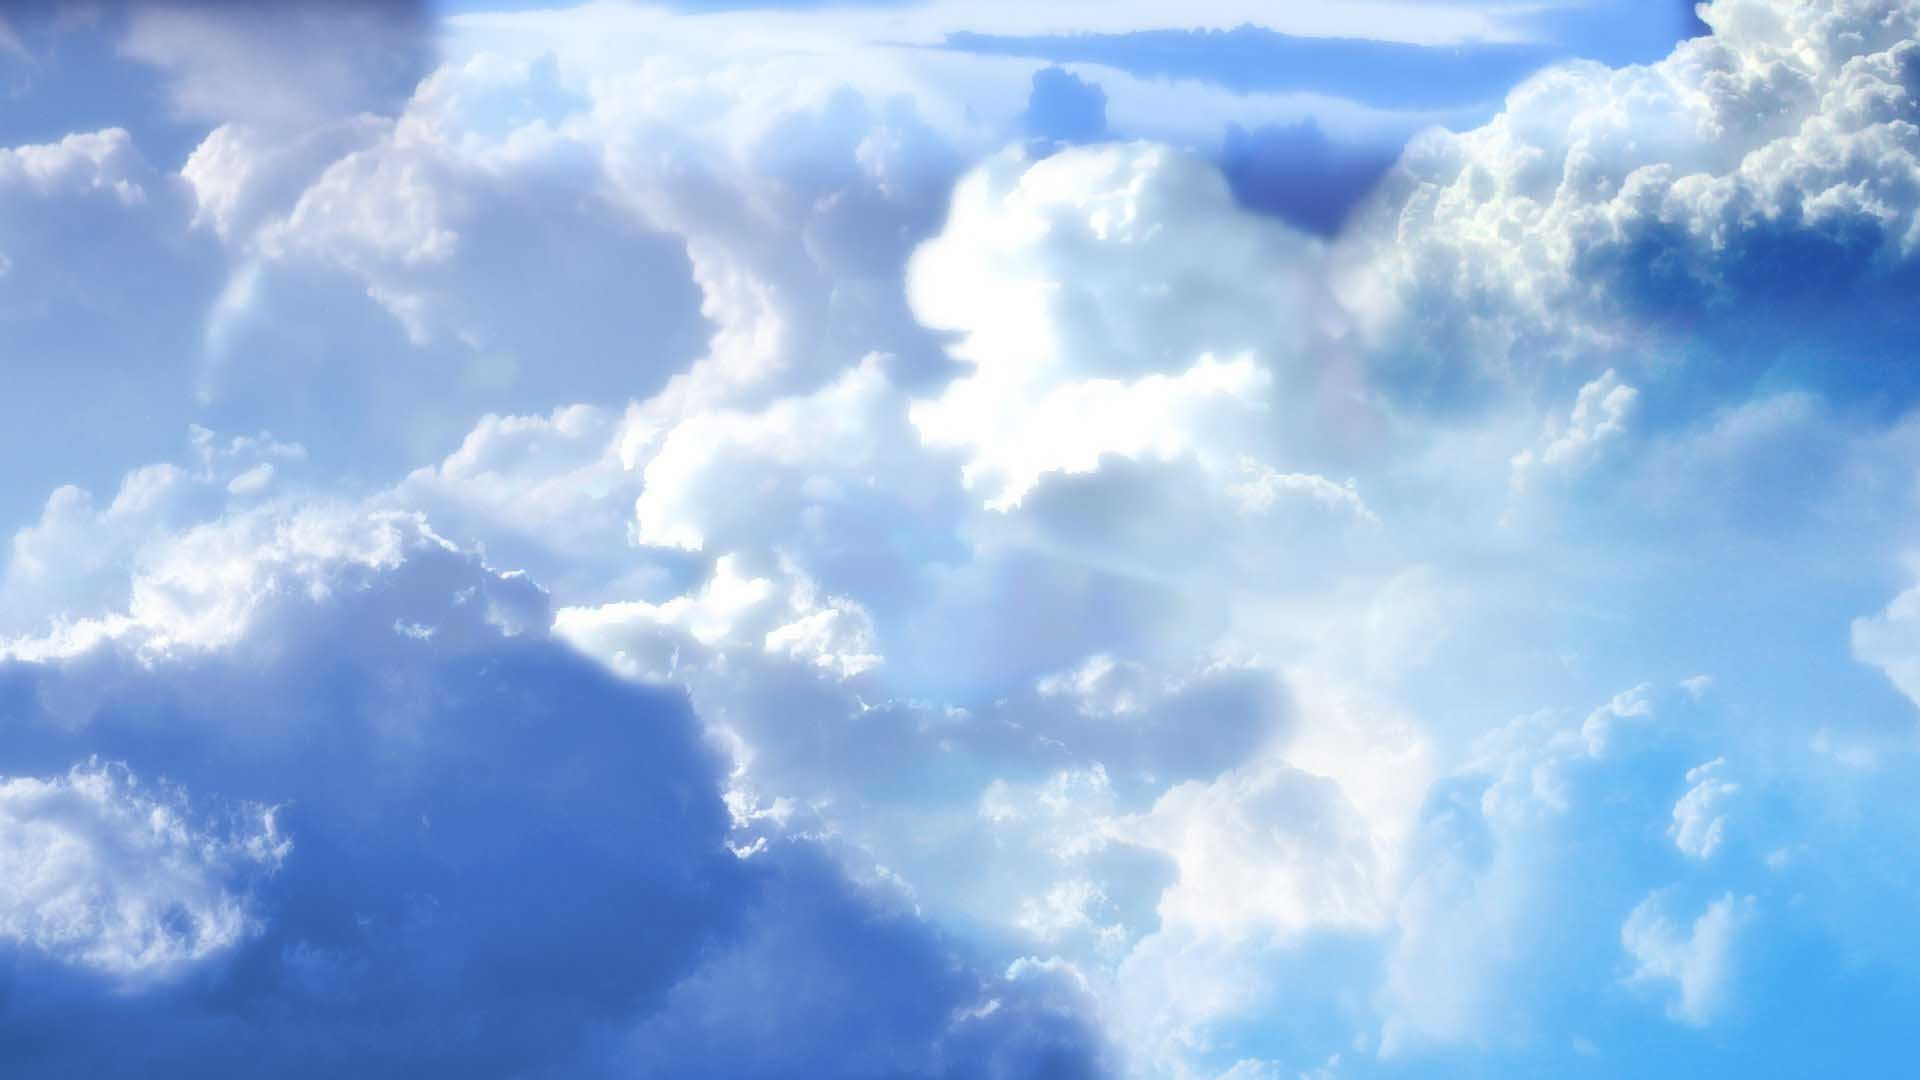 beautiful heaven hd wallpapers for desktop